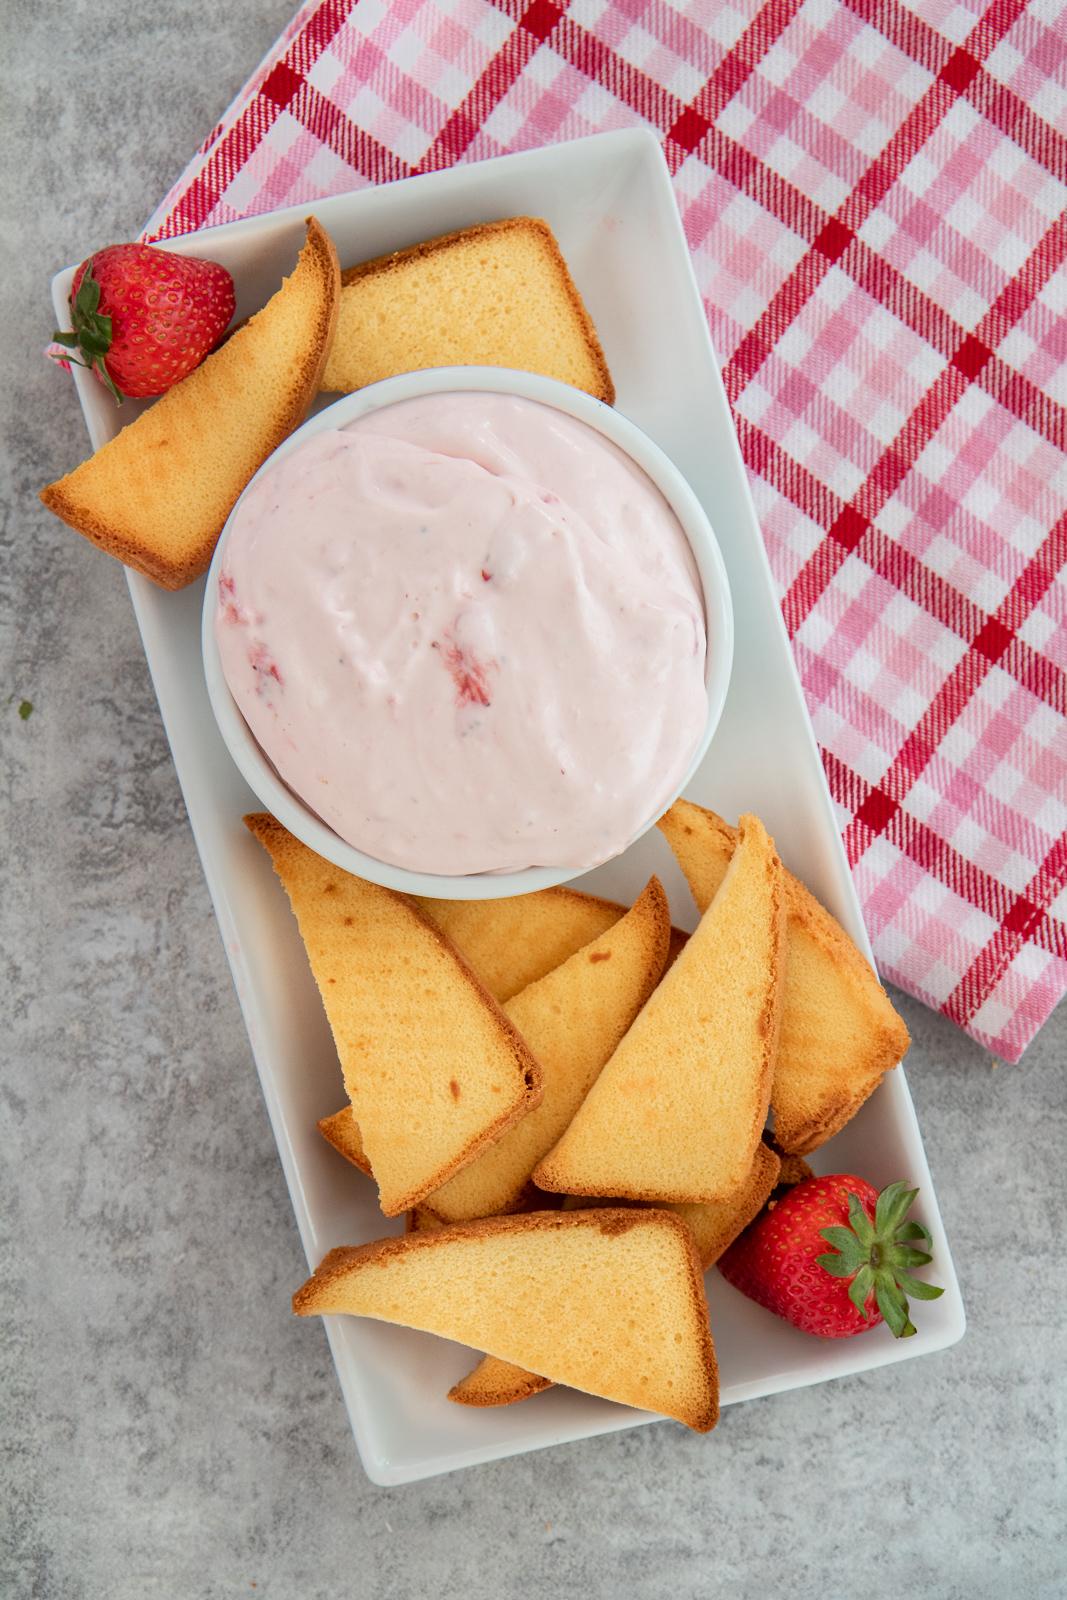 Strawberry Shortcake Chips and Dip Dessert